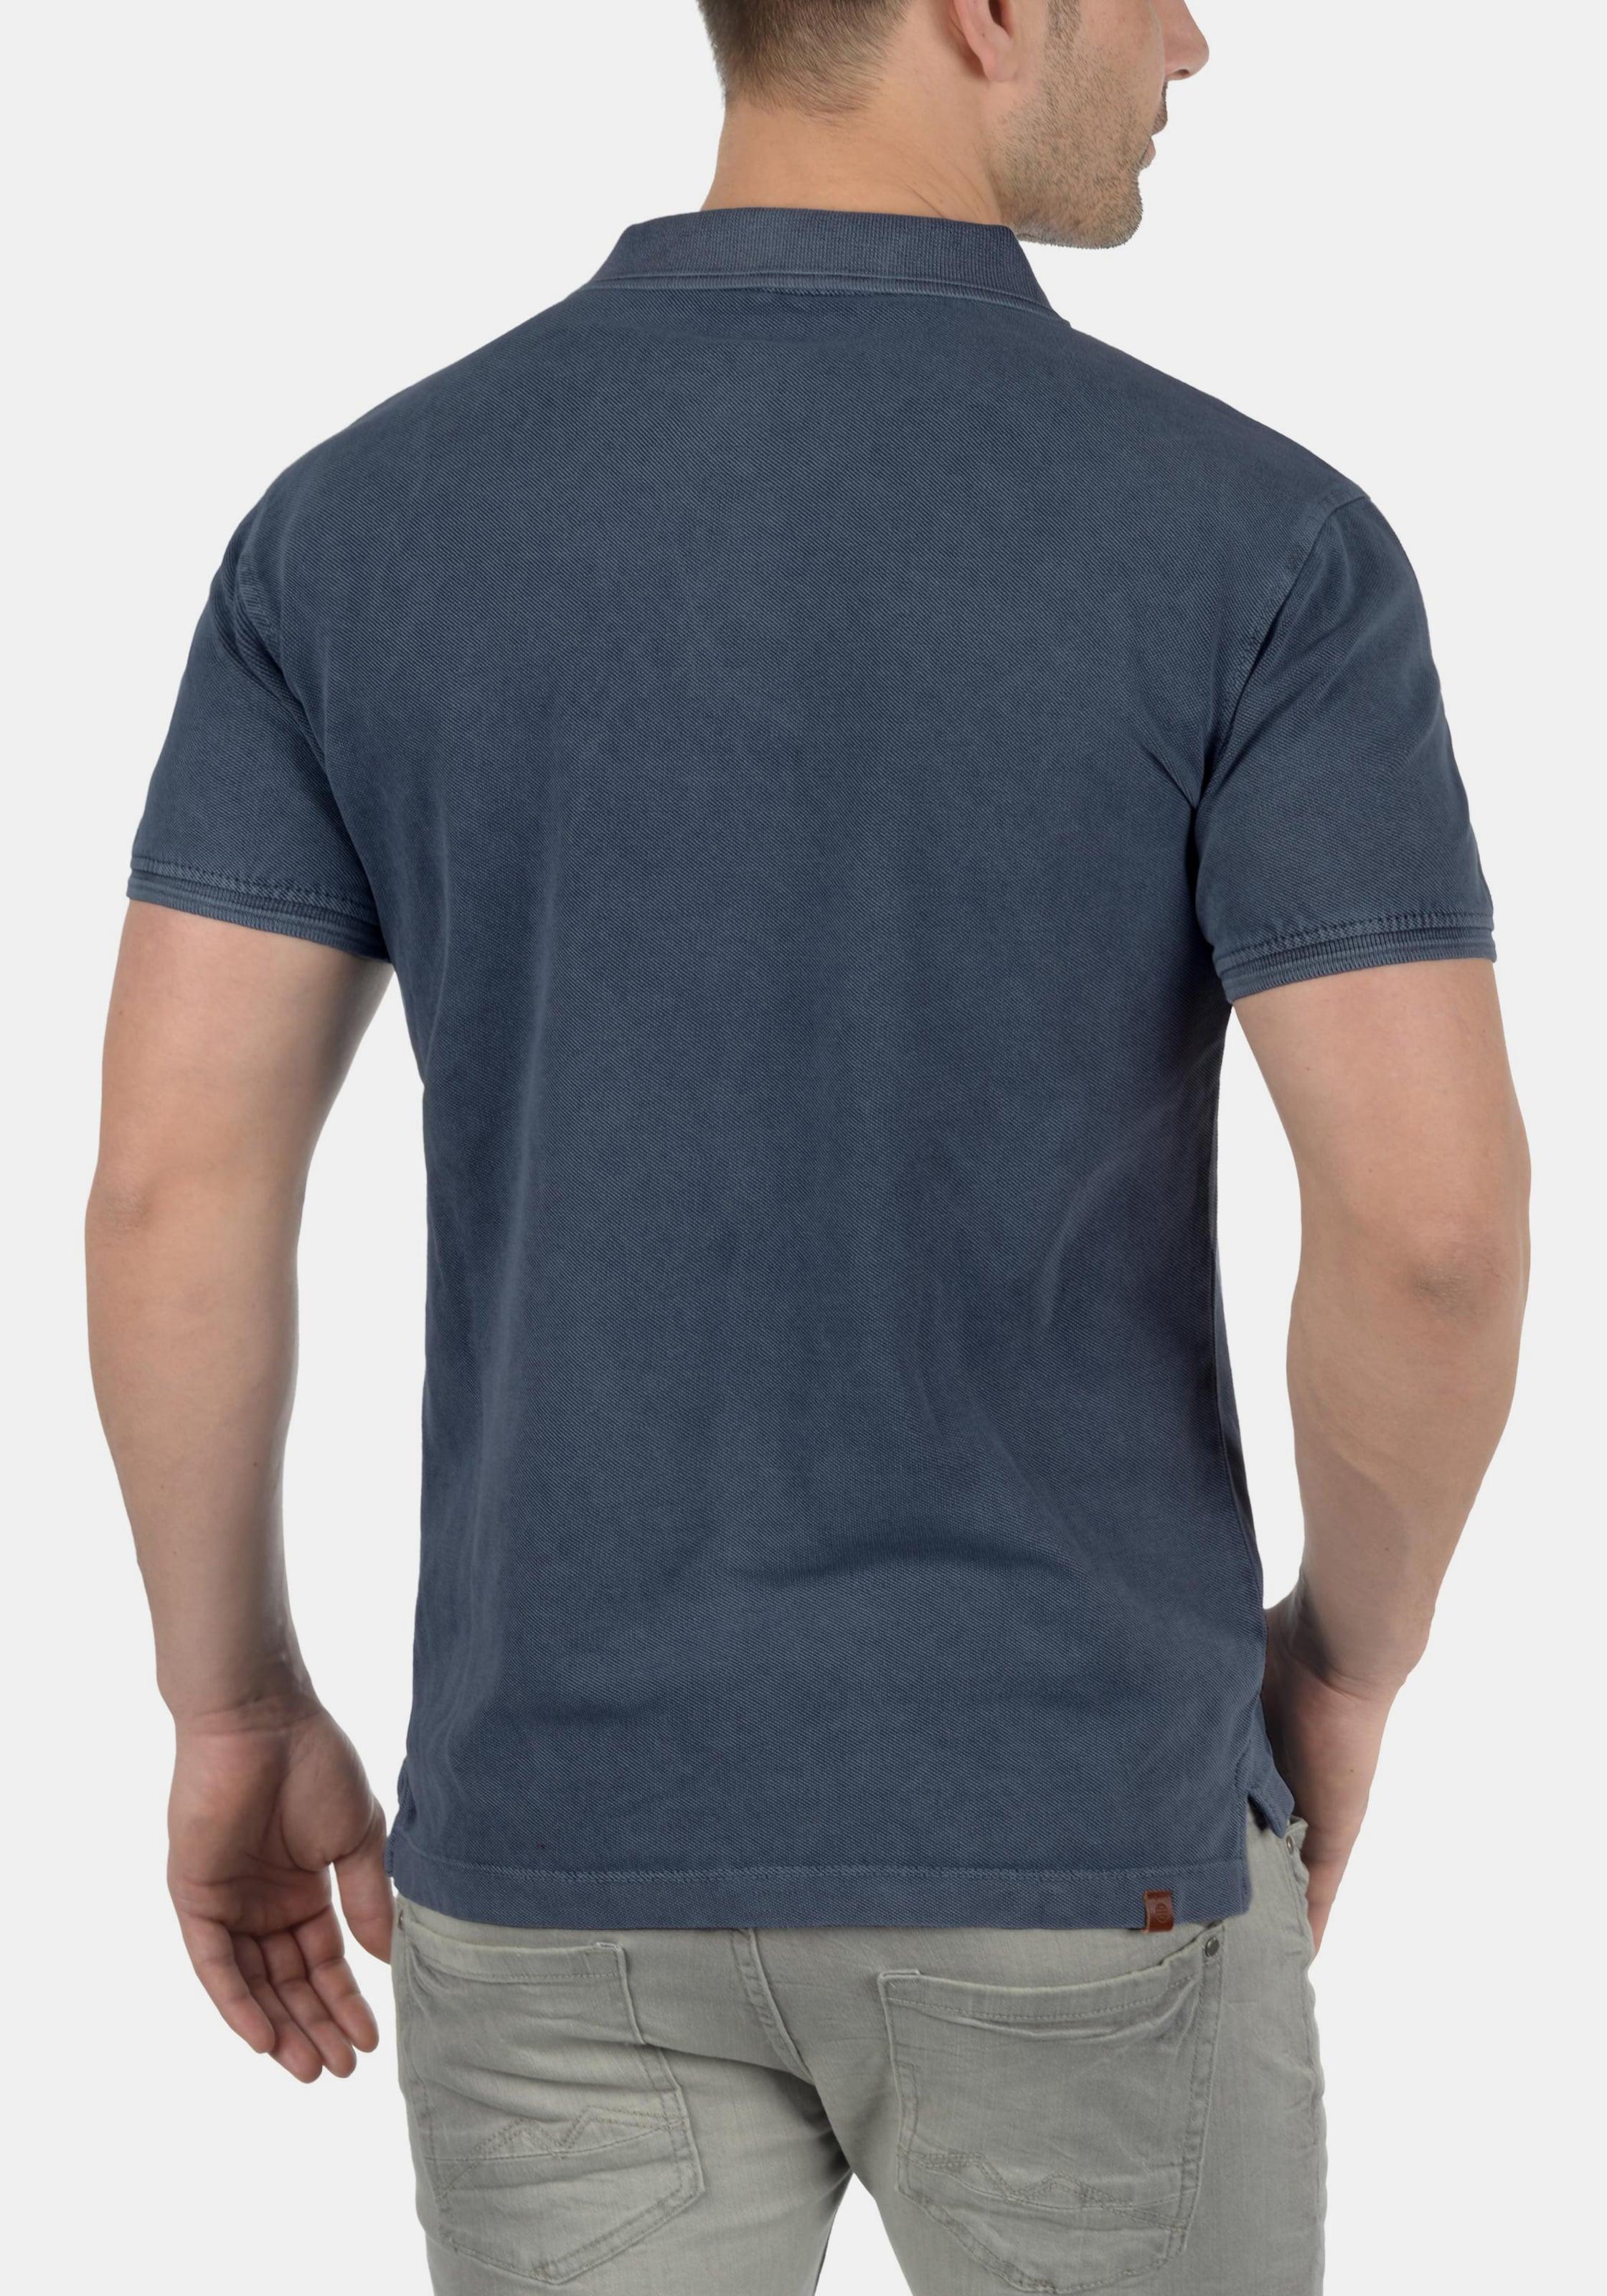 Blend Poloshirt Blend Blau Poloshirt Blau In Blend 'camper' In Poloshirt 'camper' qSVpUGzM